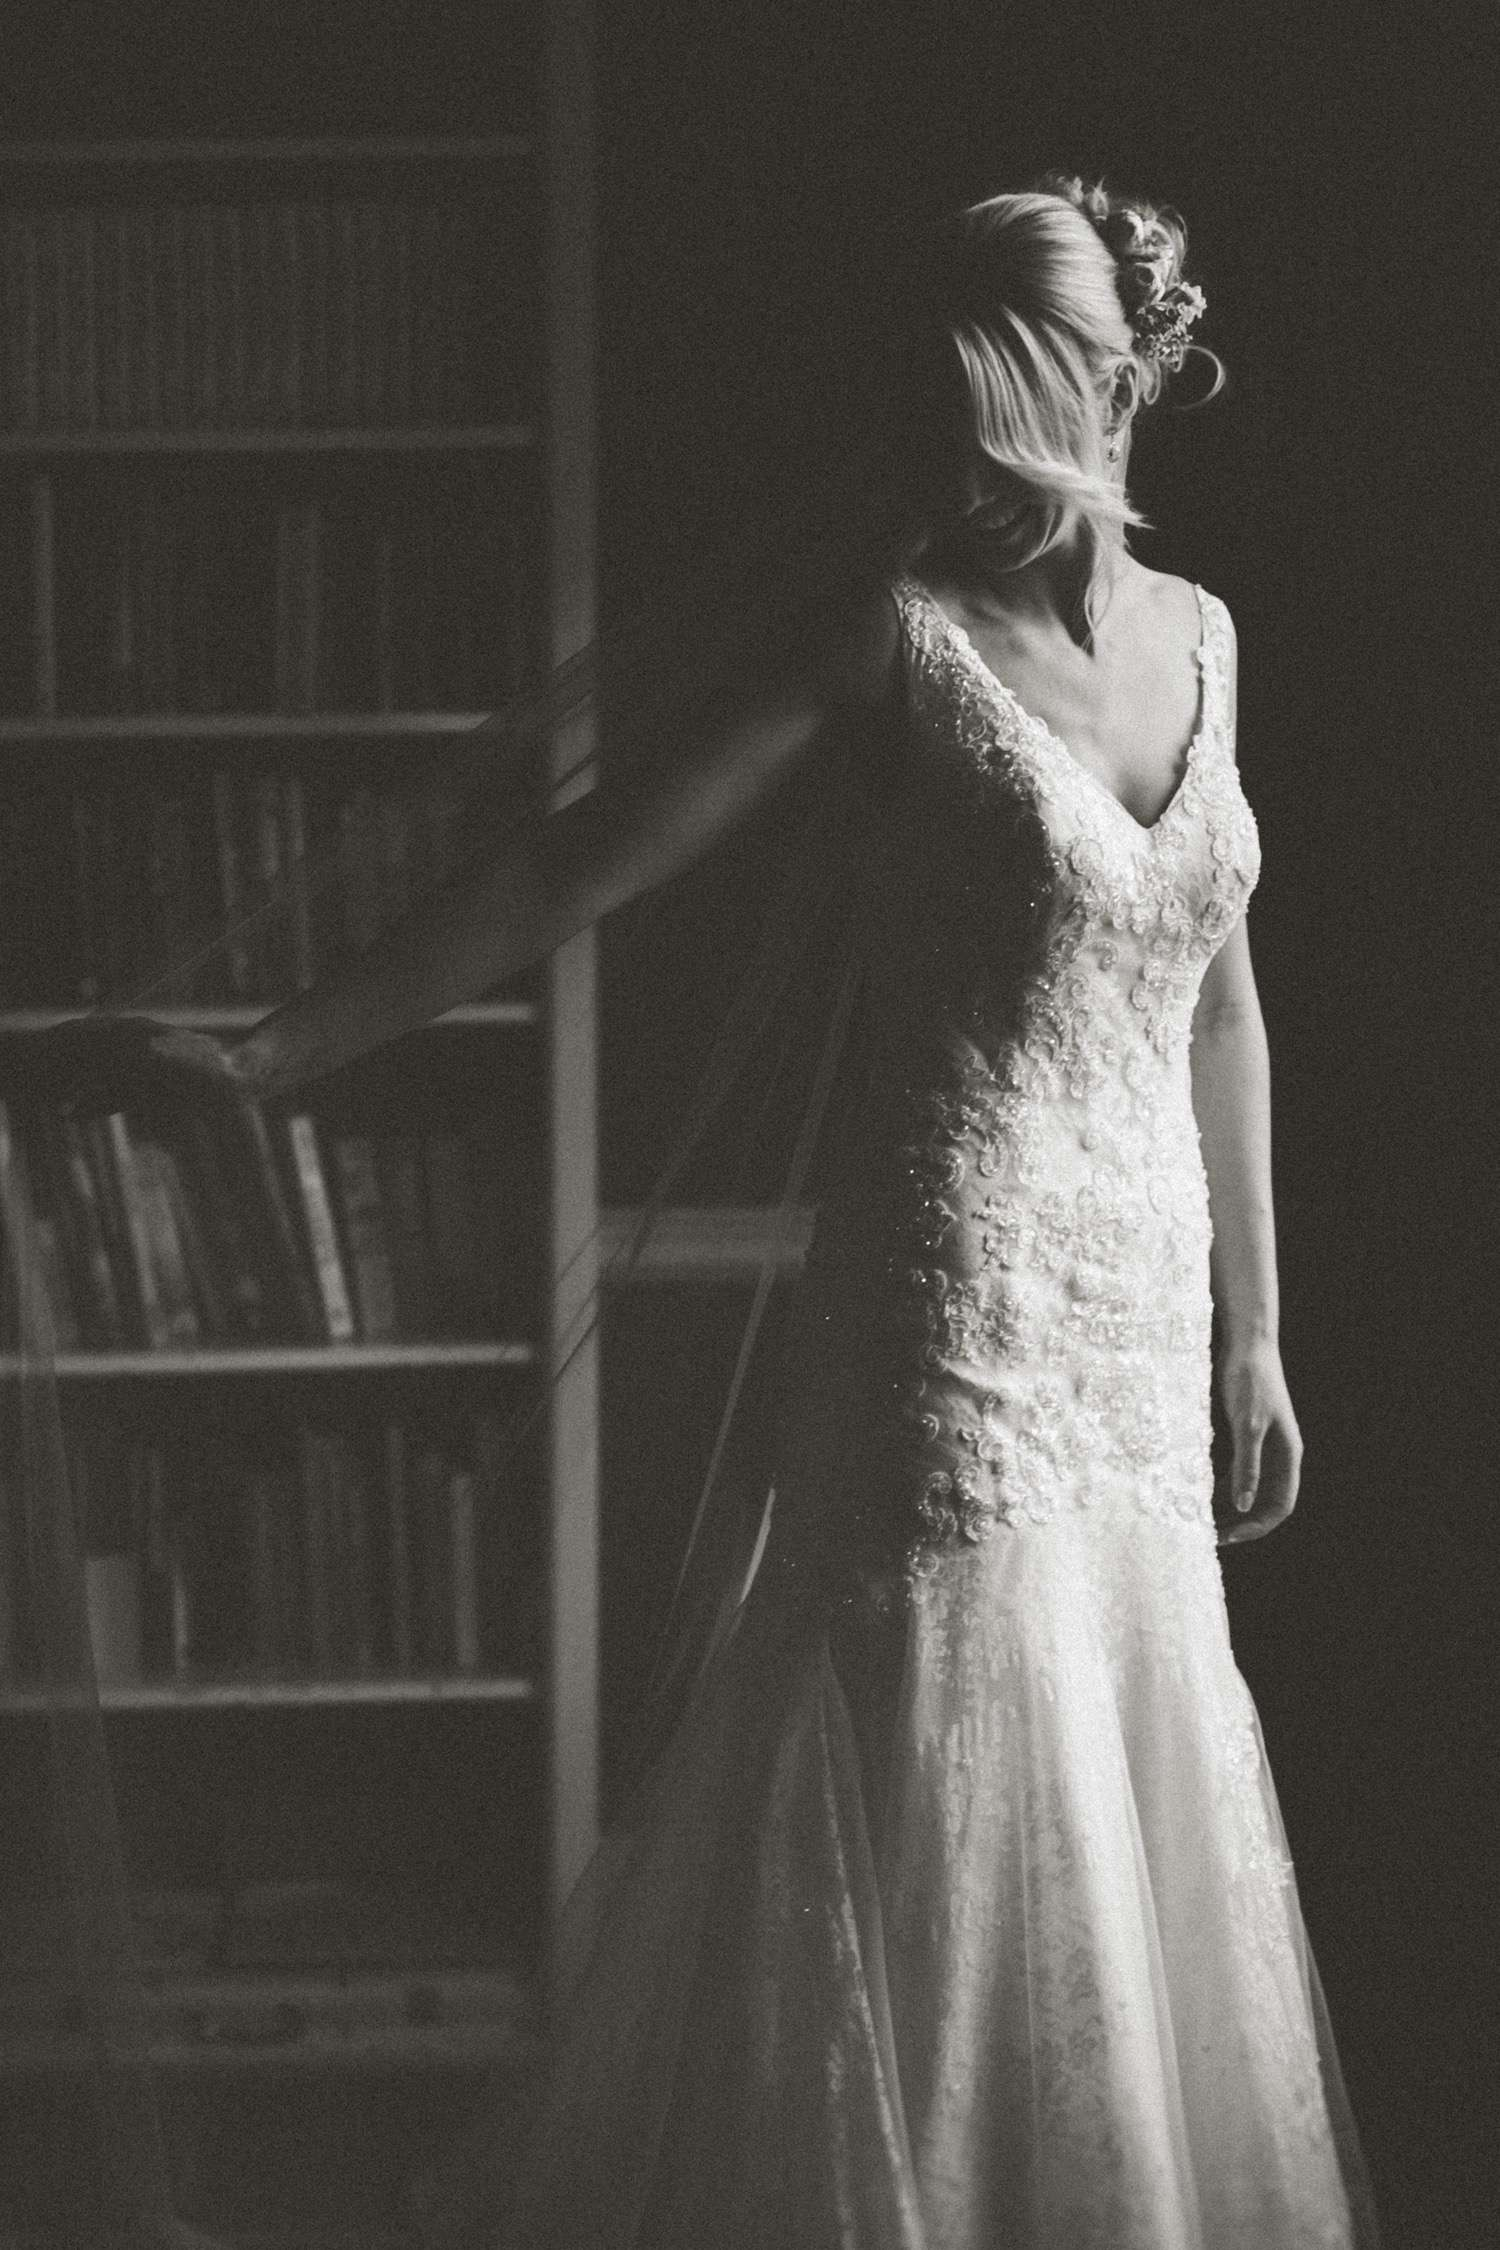 Stylish Bride // Stephanie Glover // 16 Sep Middleton Lodge